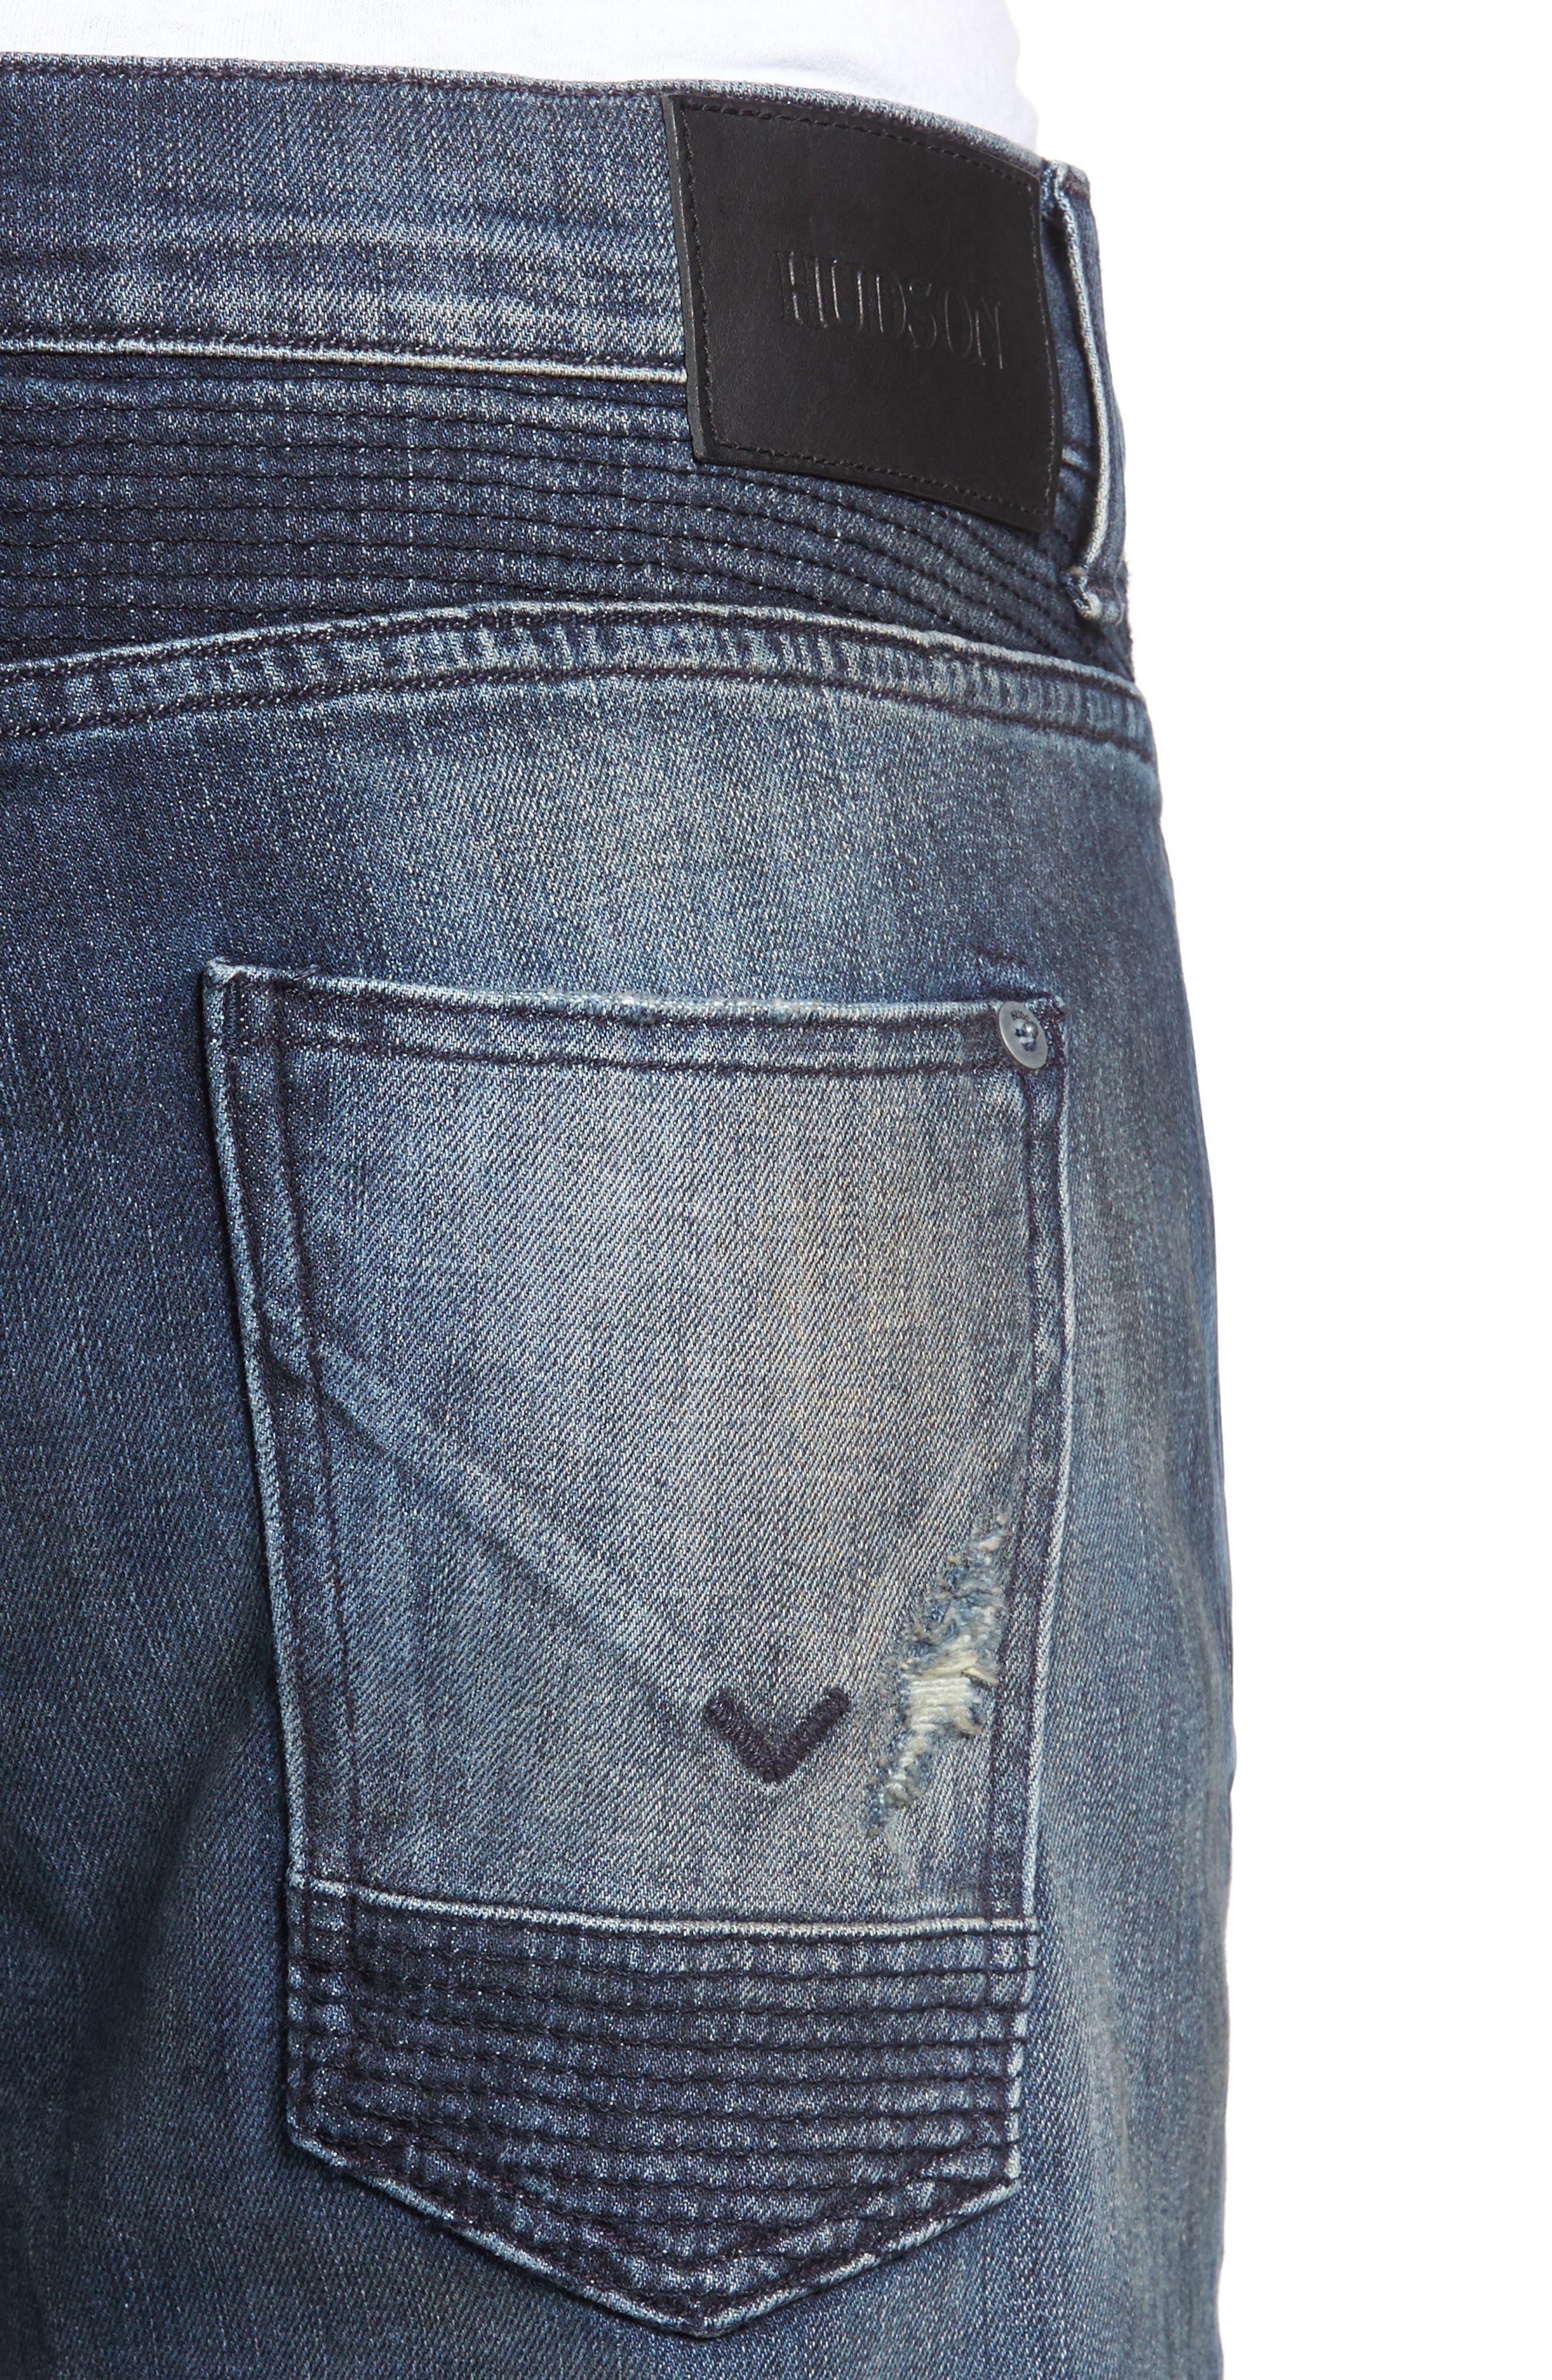 Blinder Biker Moto Skinny Fit Jeans,                             Alternate thumbnail 4, color,                             425